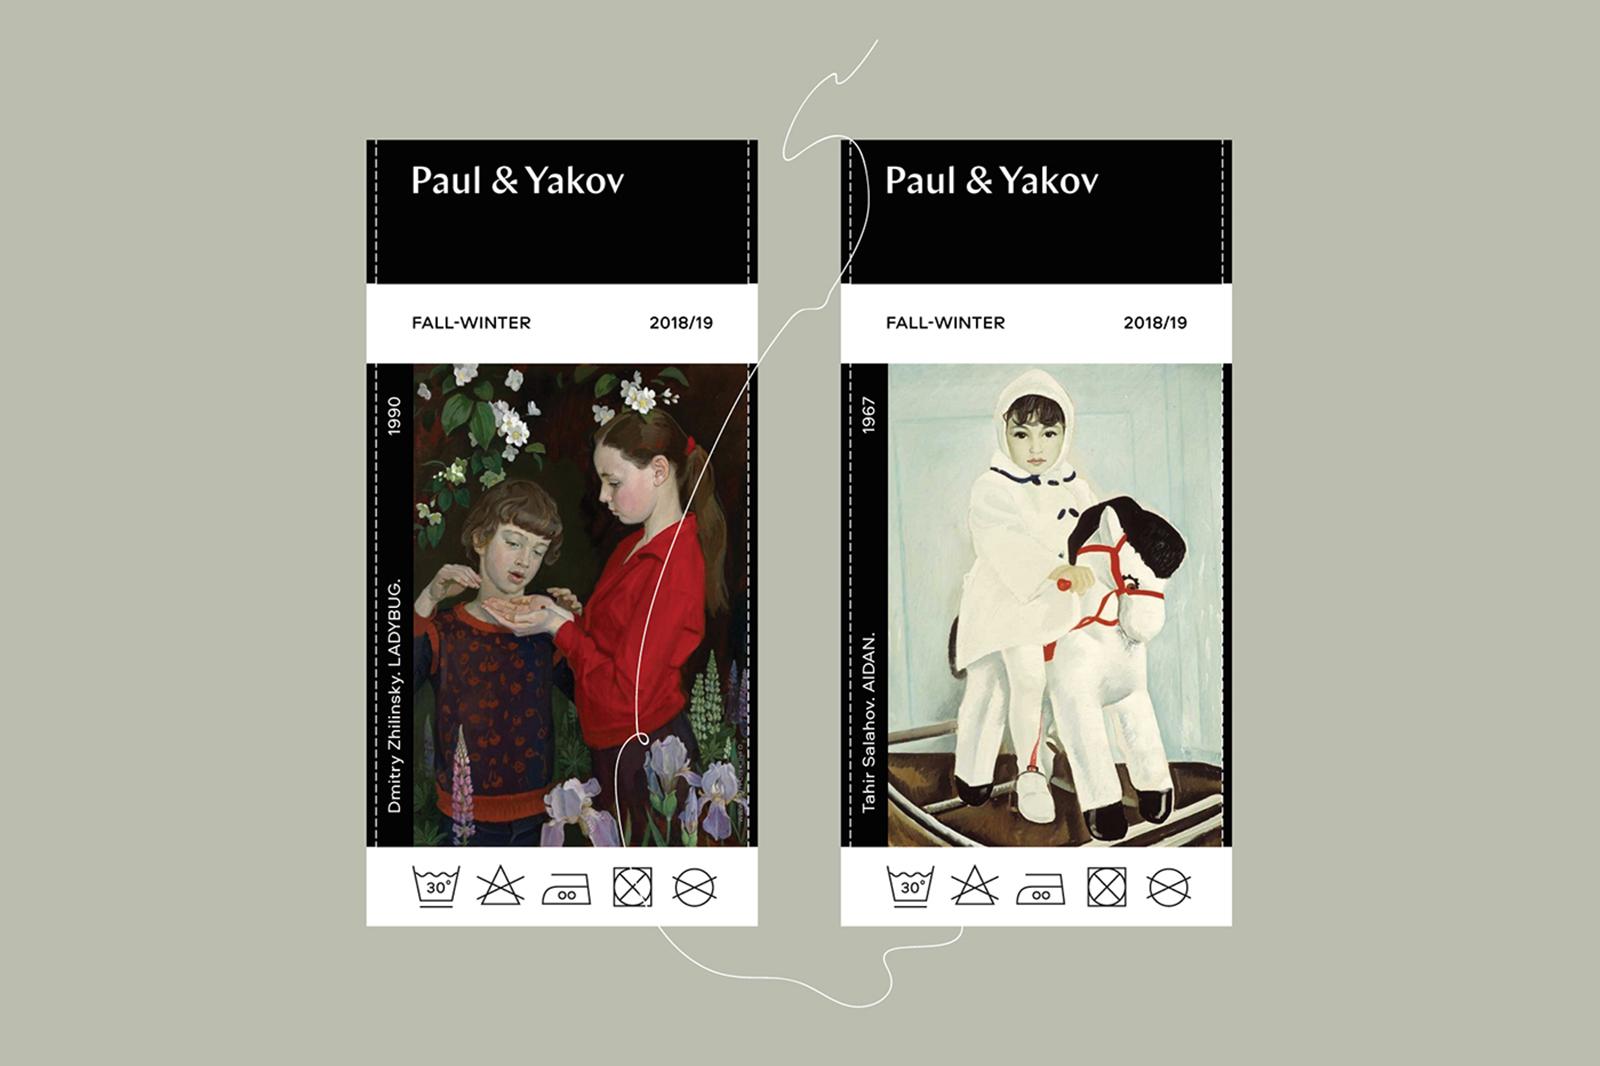 Paul & Yakov 时装品牌视觉VI形象设计欣赏-深圳VI设计13